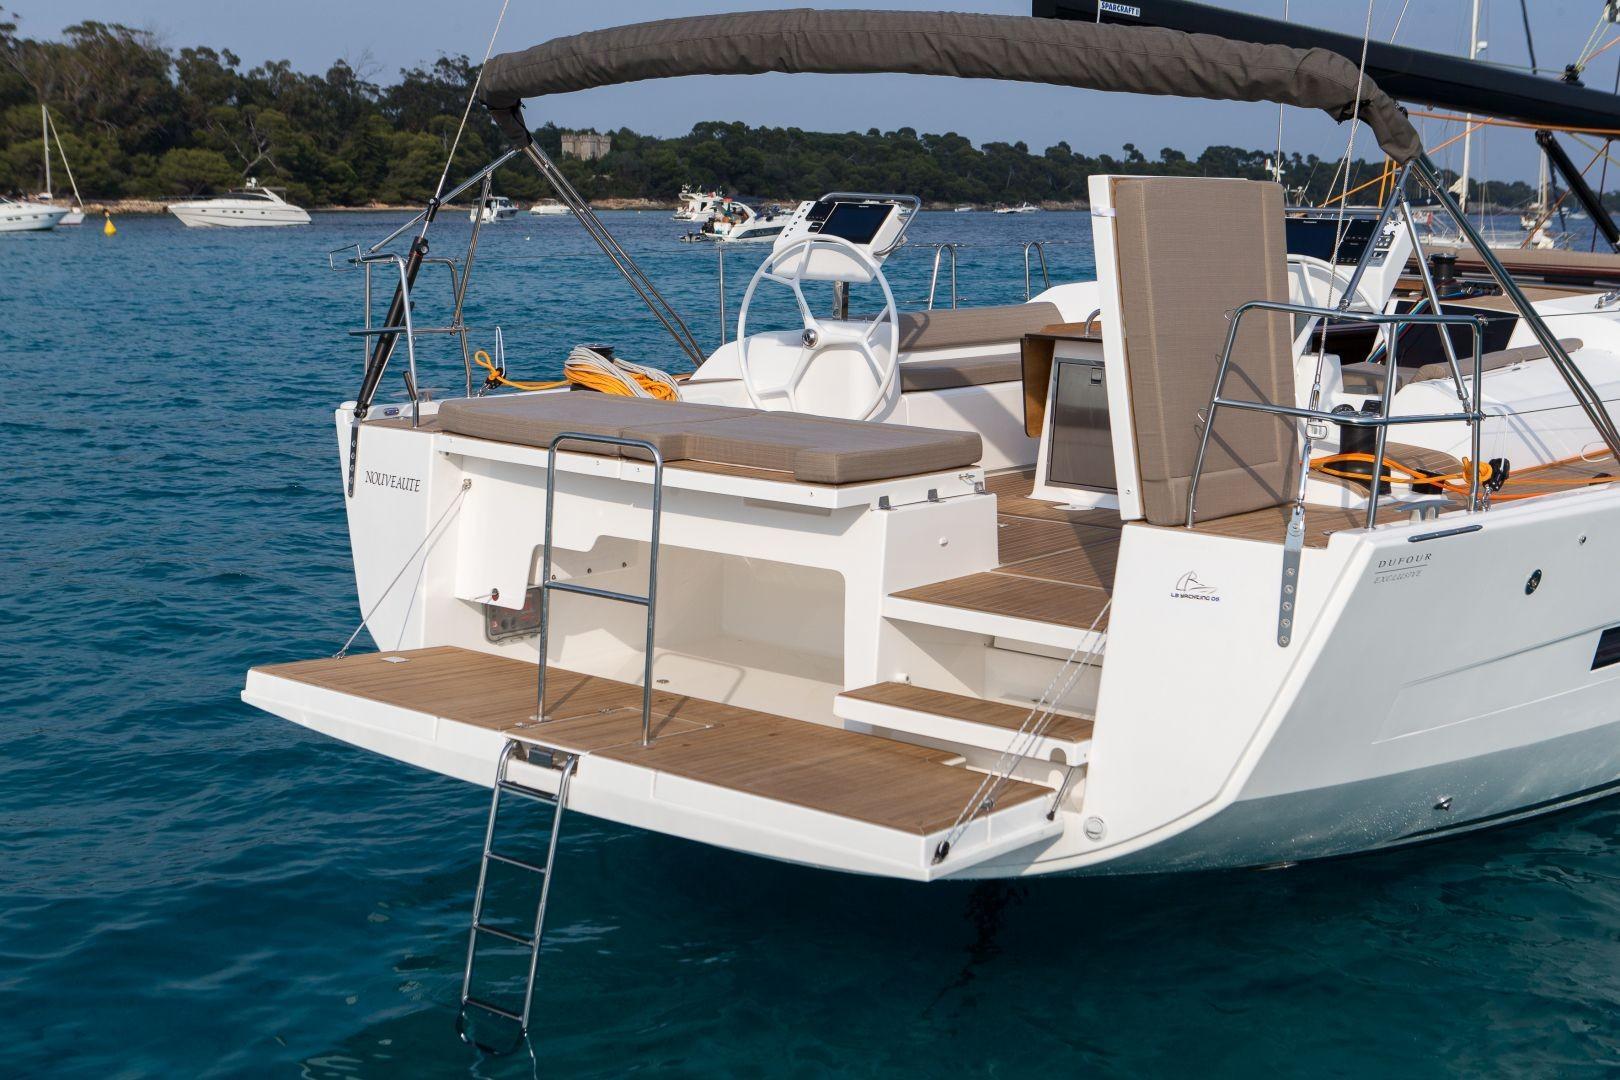 Manufacturer Provided Image: Dufour Exclusive 56 Bathing Platform